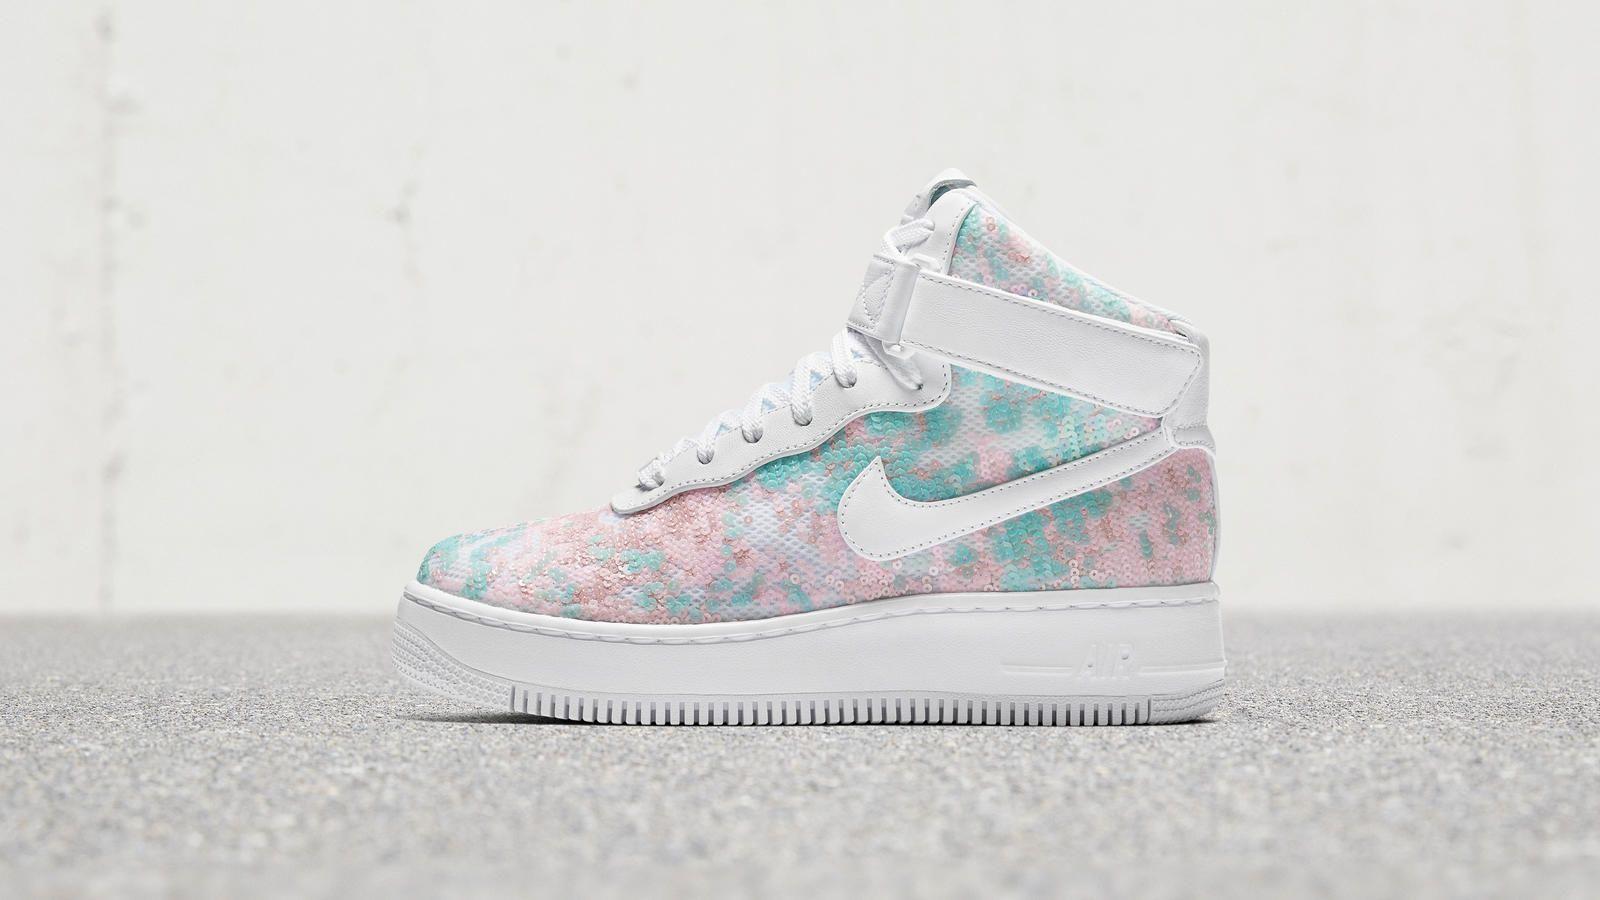 Air Force 1 07 Lx Baskets Basses Nike Air Force 1 Upstep Hi Lx Nike Sneakers Women Nike Sneakers